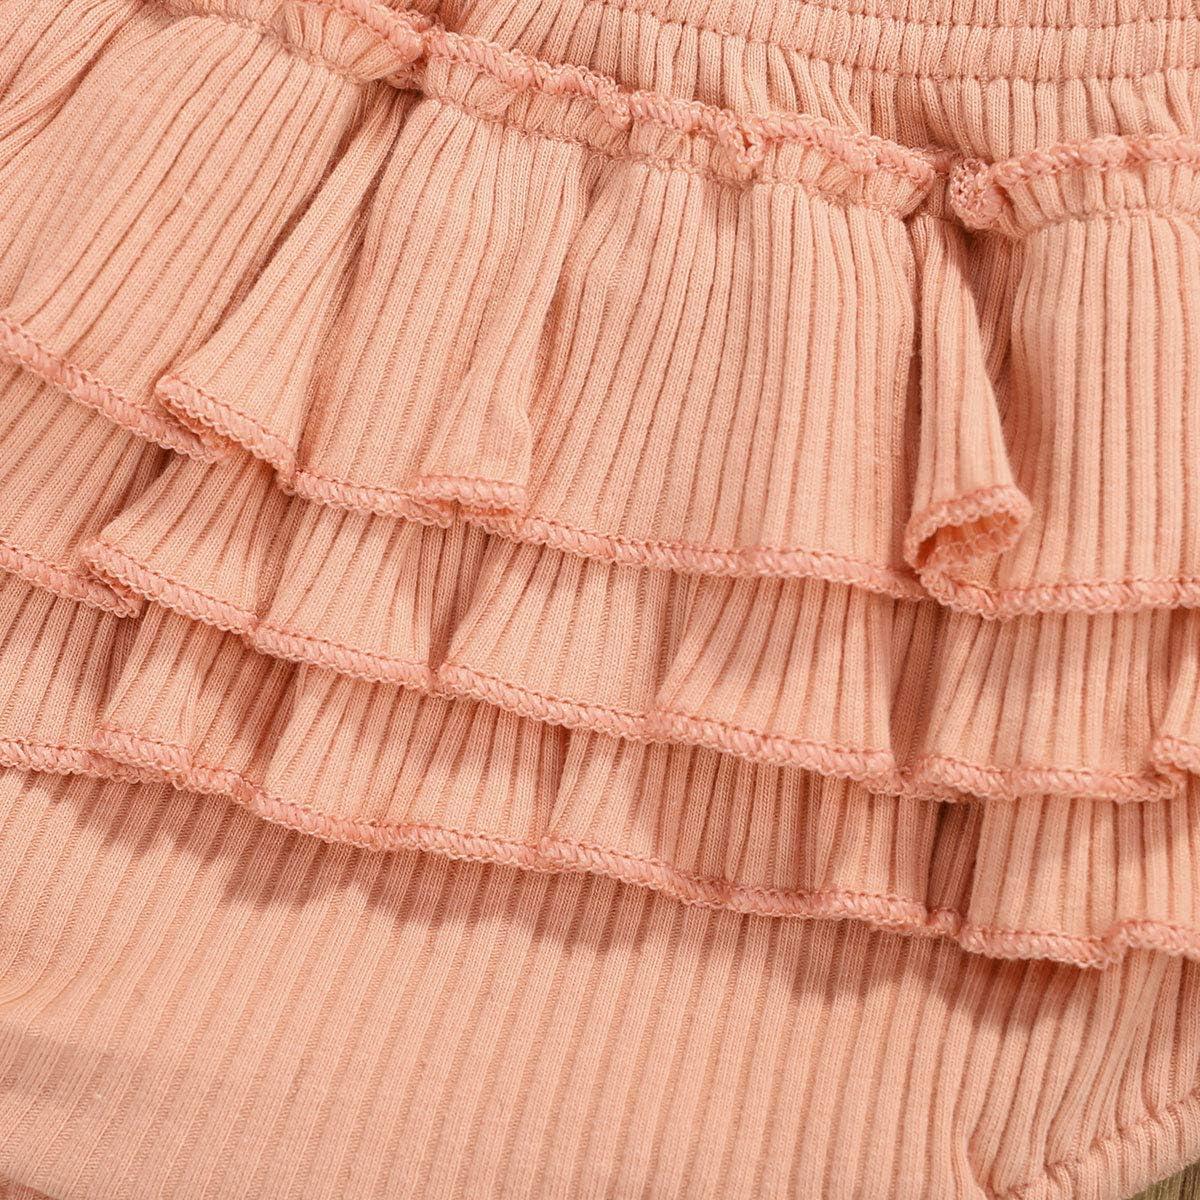 Yccutest Baby Girl Clothes Long Sleeve Romper+Ruffle Shorts+Headband 3Pcs Newborn Infant Outfits Girl Bodysuit